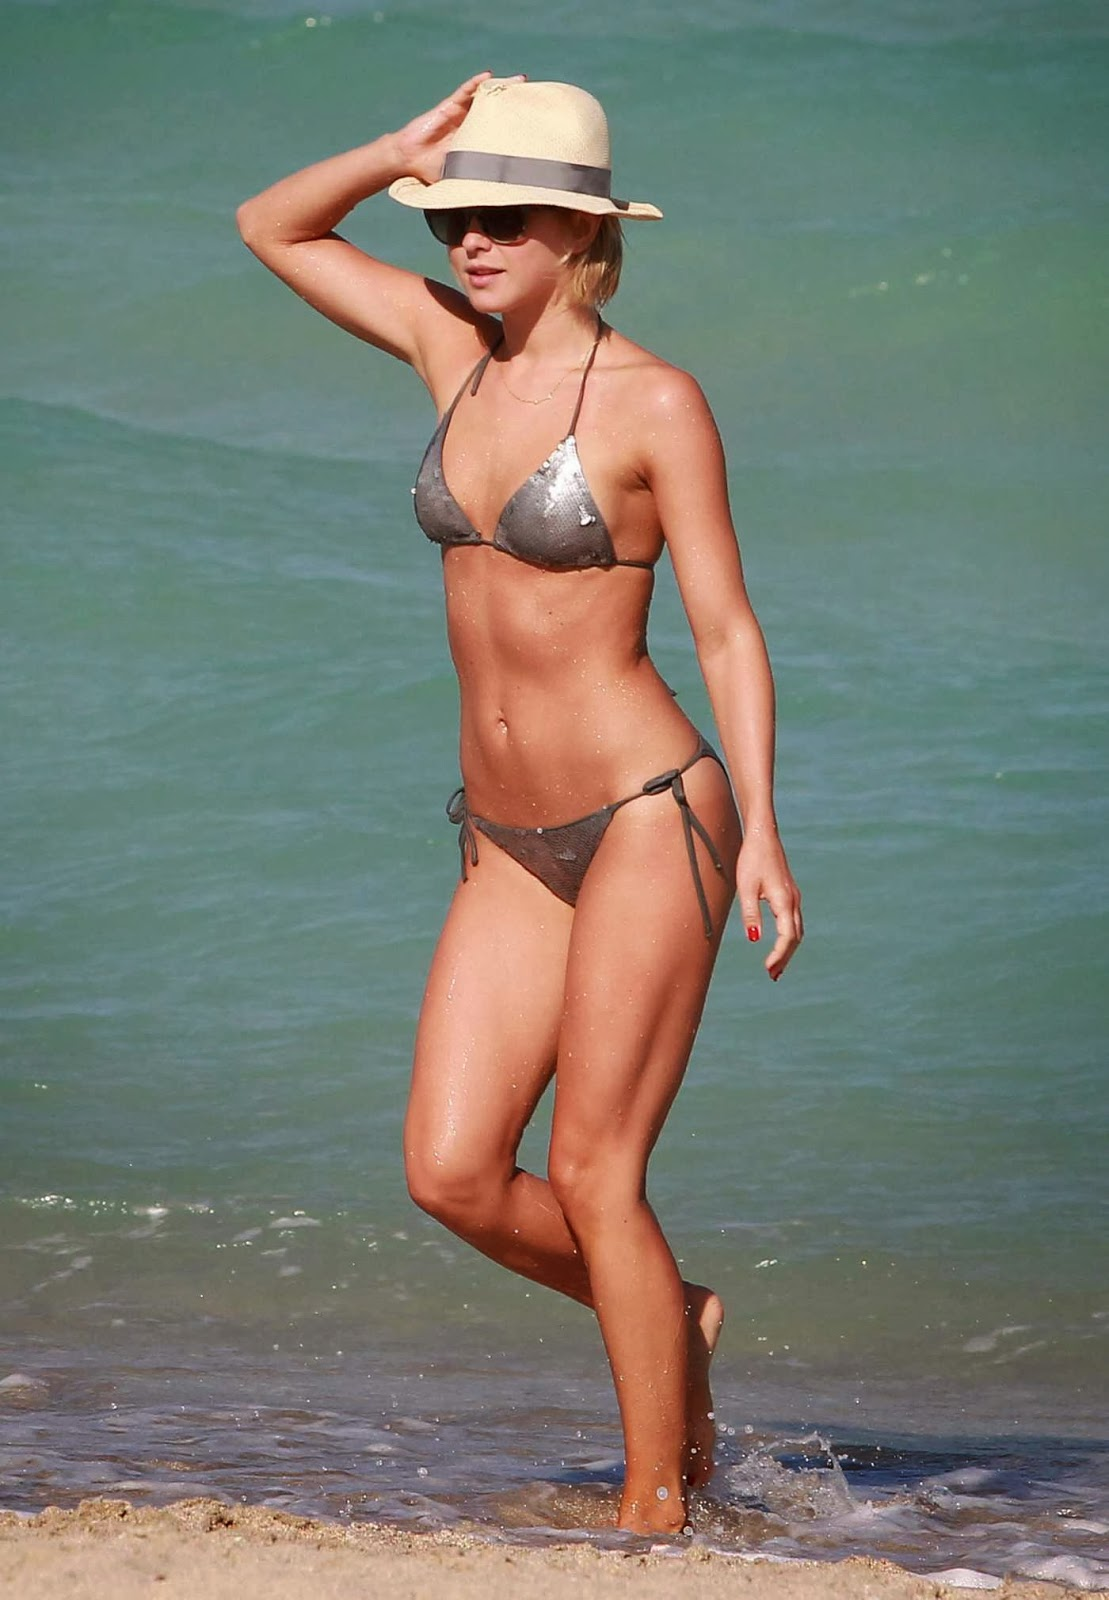 Agree, Julianne hough miami bikini